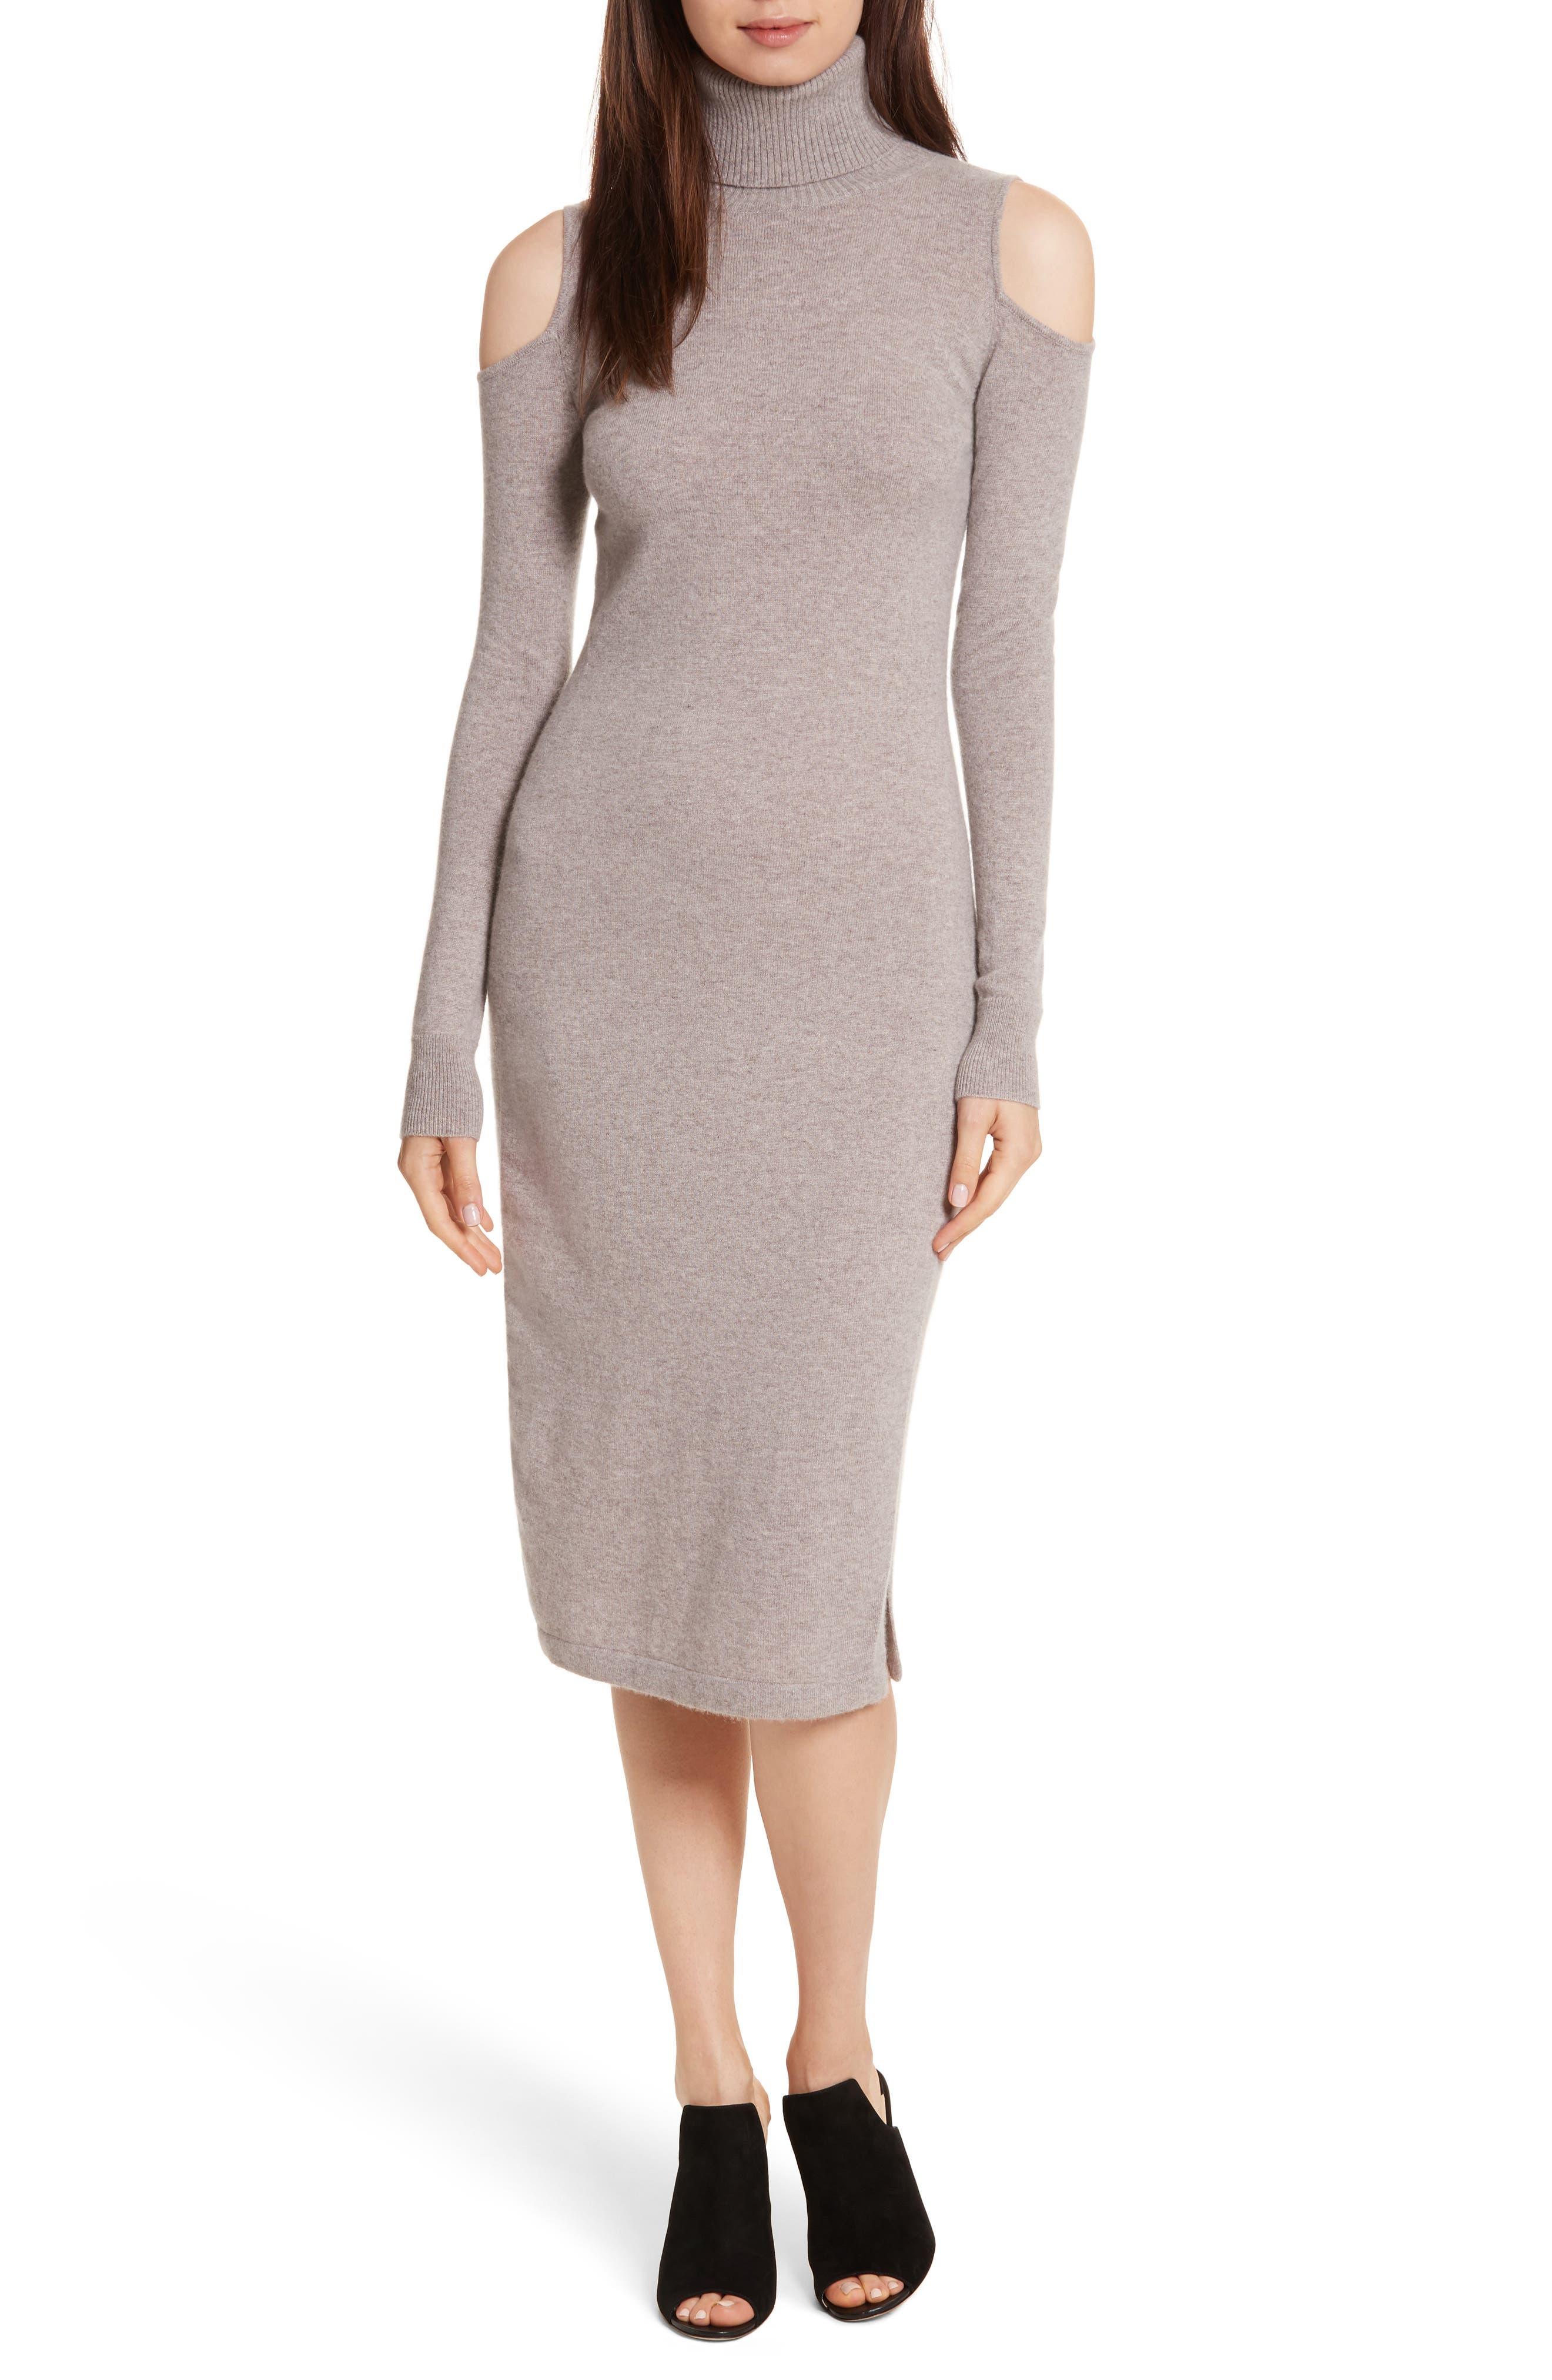 Alternate Image 1 Selected - autumn cashmere Cashmere Cold Shoulder Turtleneck Sweater Dress